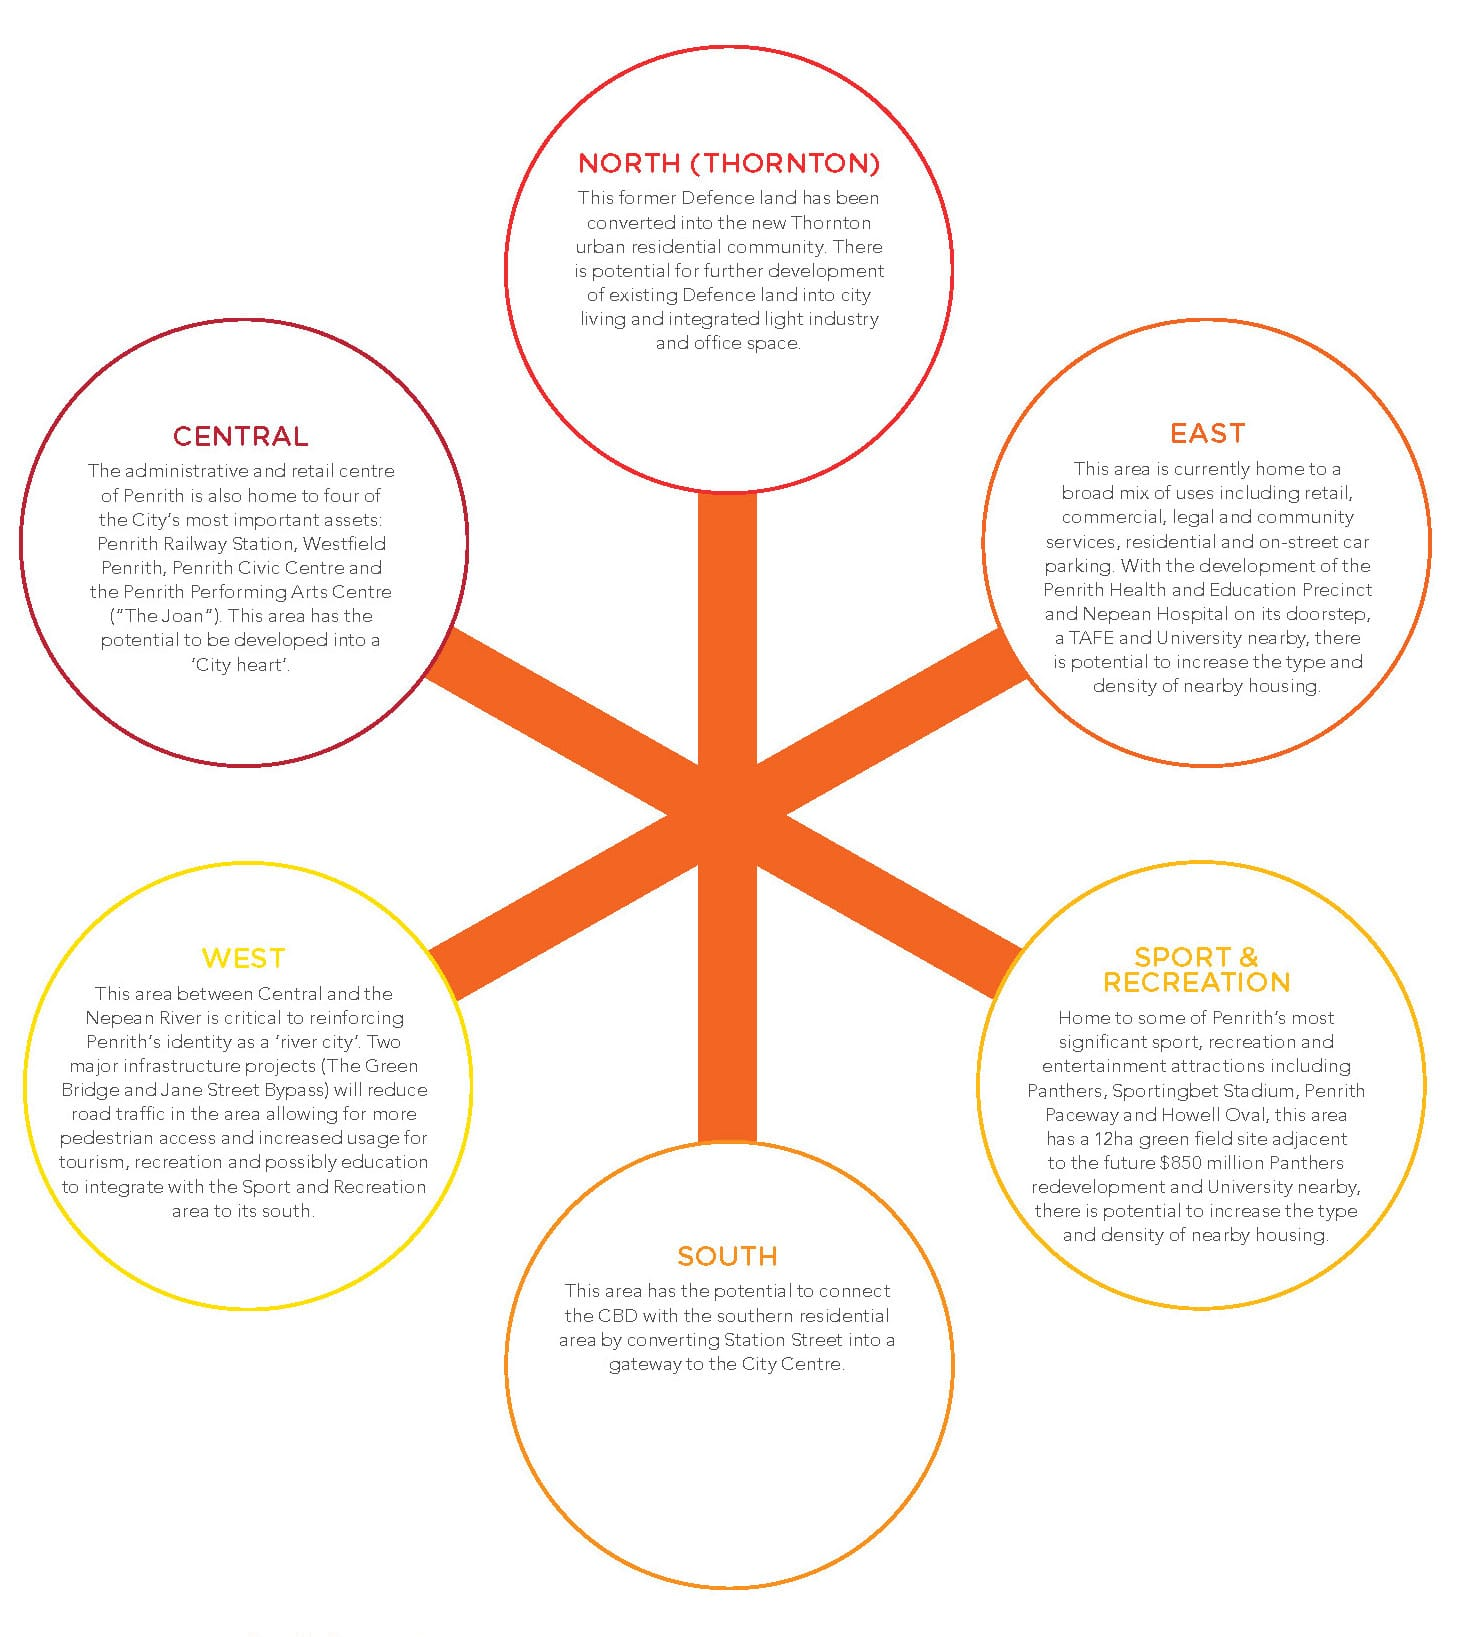 The key focus areas of Penrith Progression